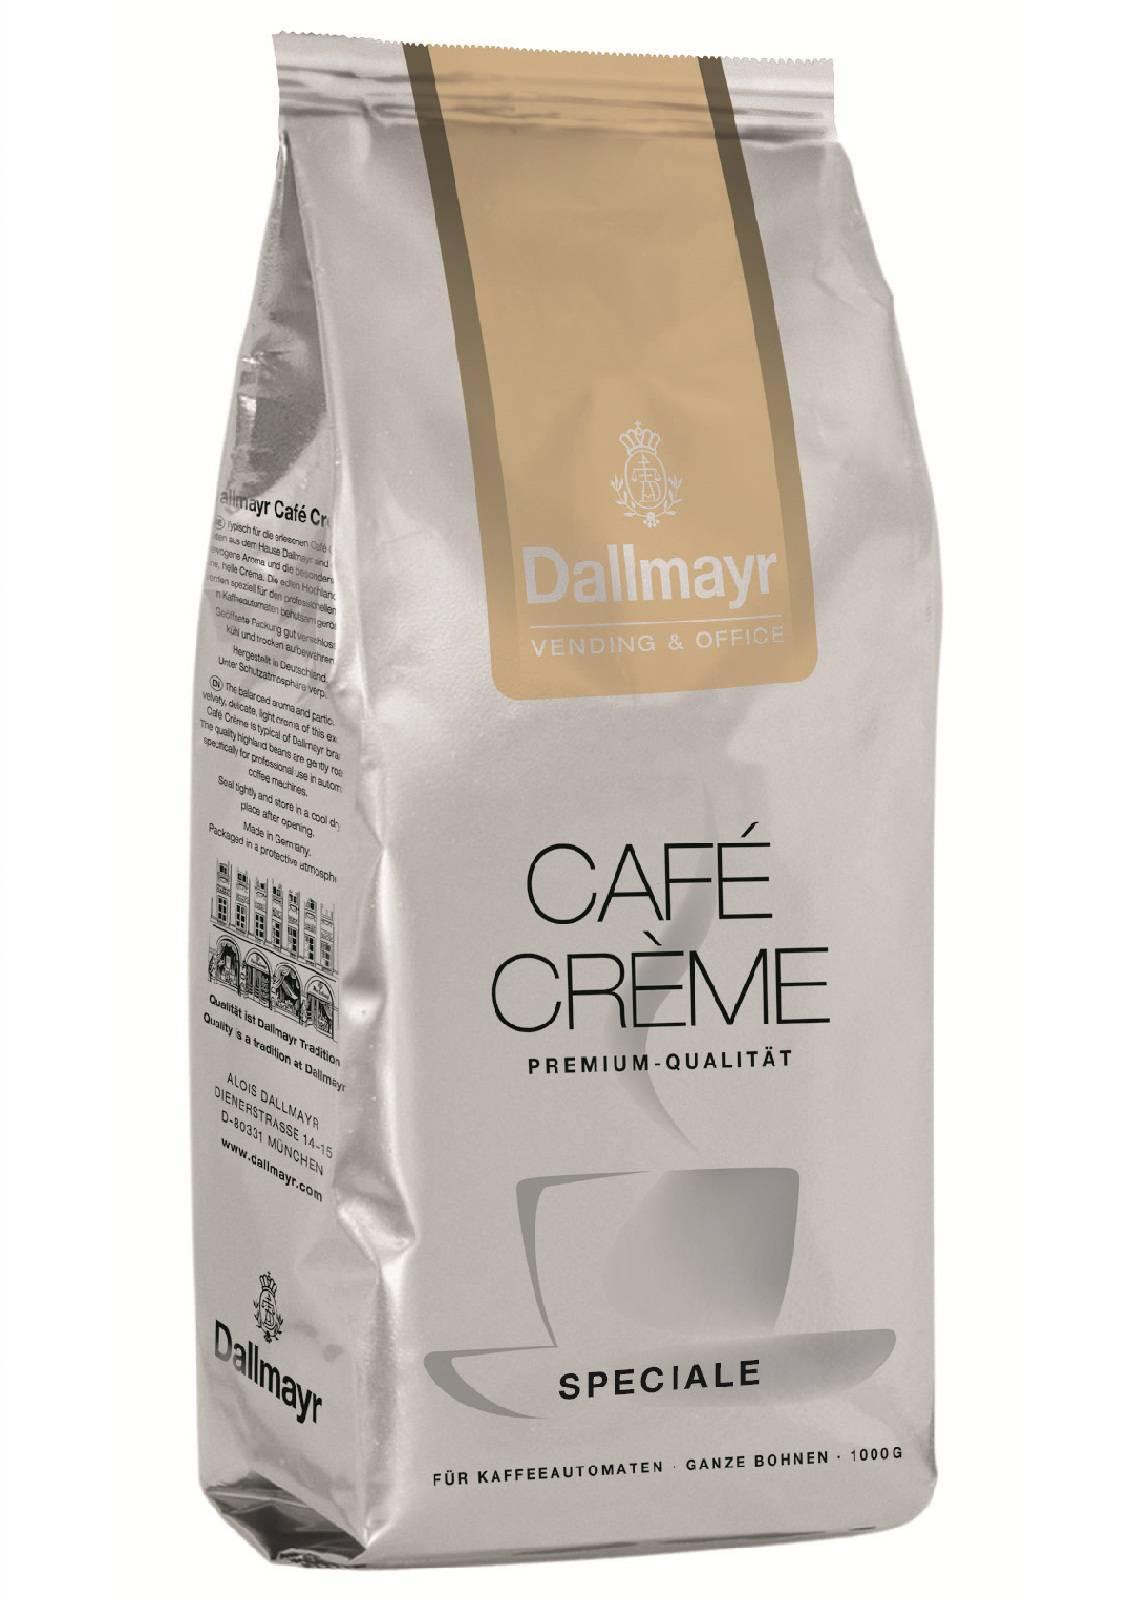 8 x dallmayr cafe creme speciale 1kg f r kaffeeautomaten kaffee ganze bohnen. Black Bedroom Furniture Sets. Home Design Ideas